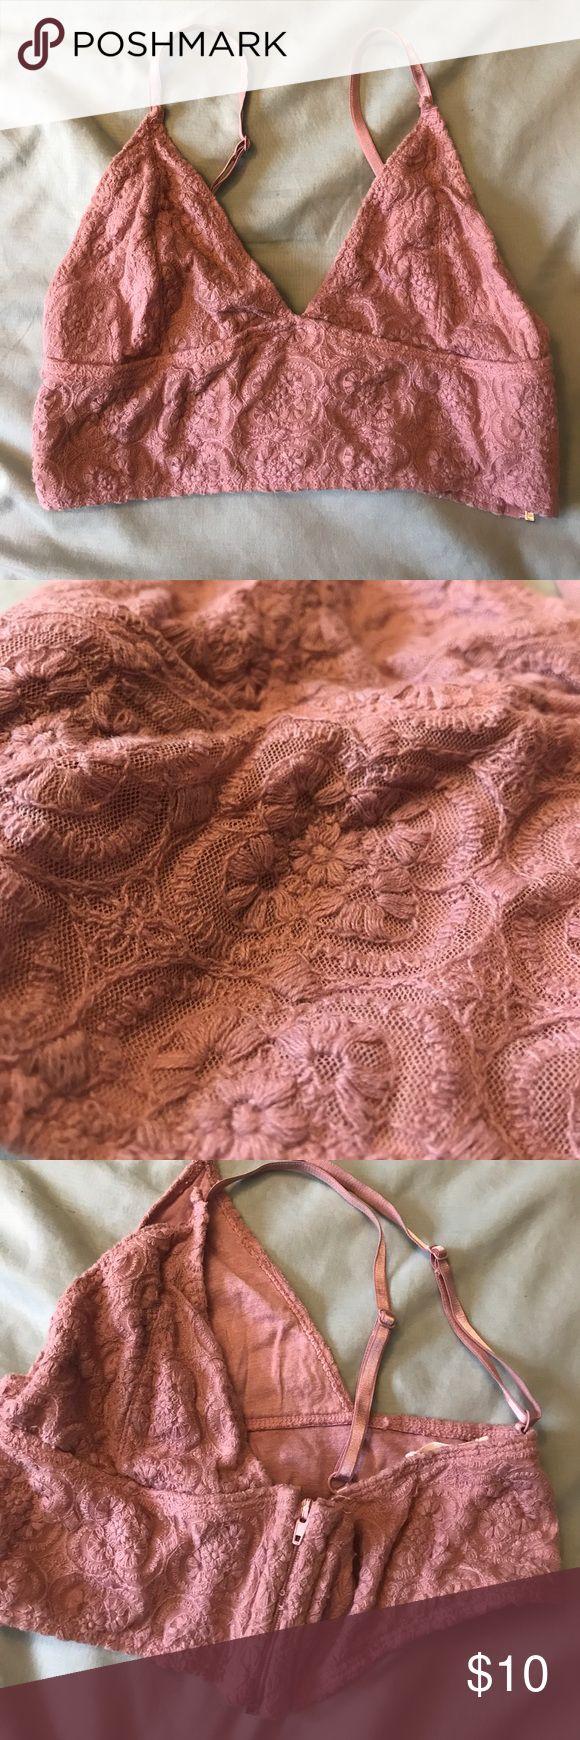 Blush pink Pins and Needles bralette Blush pink embroidered bralette, size medium. Zipper on the side for easy wear, adjustable straps, wide supportive band. Pins and Needles brand Pins & Needles Intimates & Sleepwear Bras